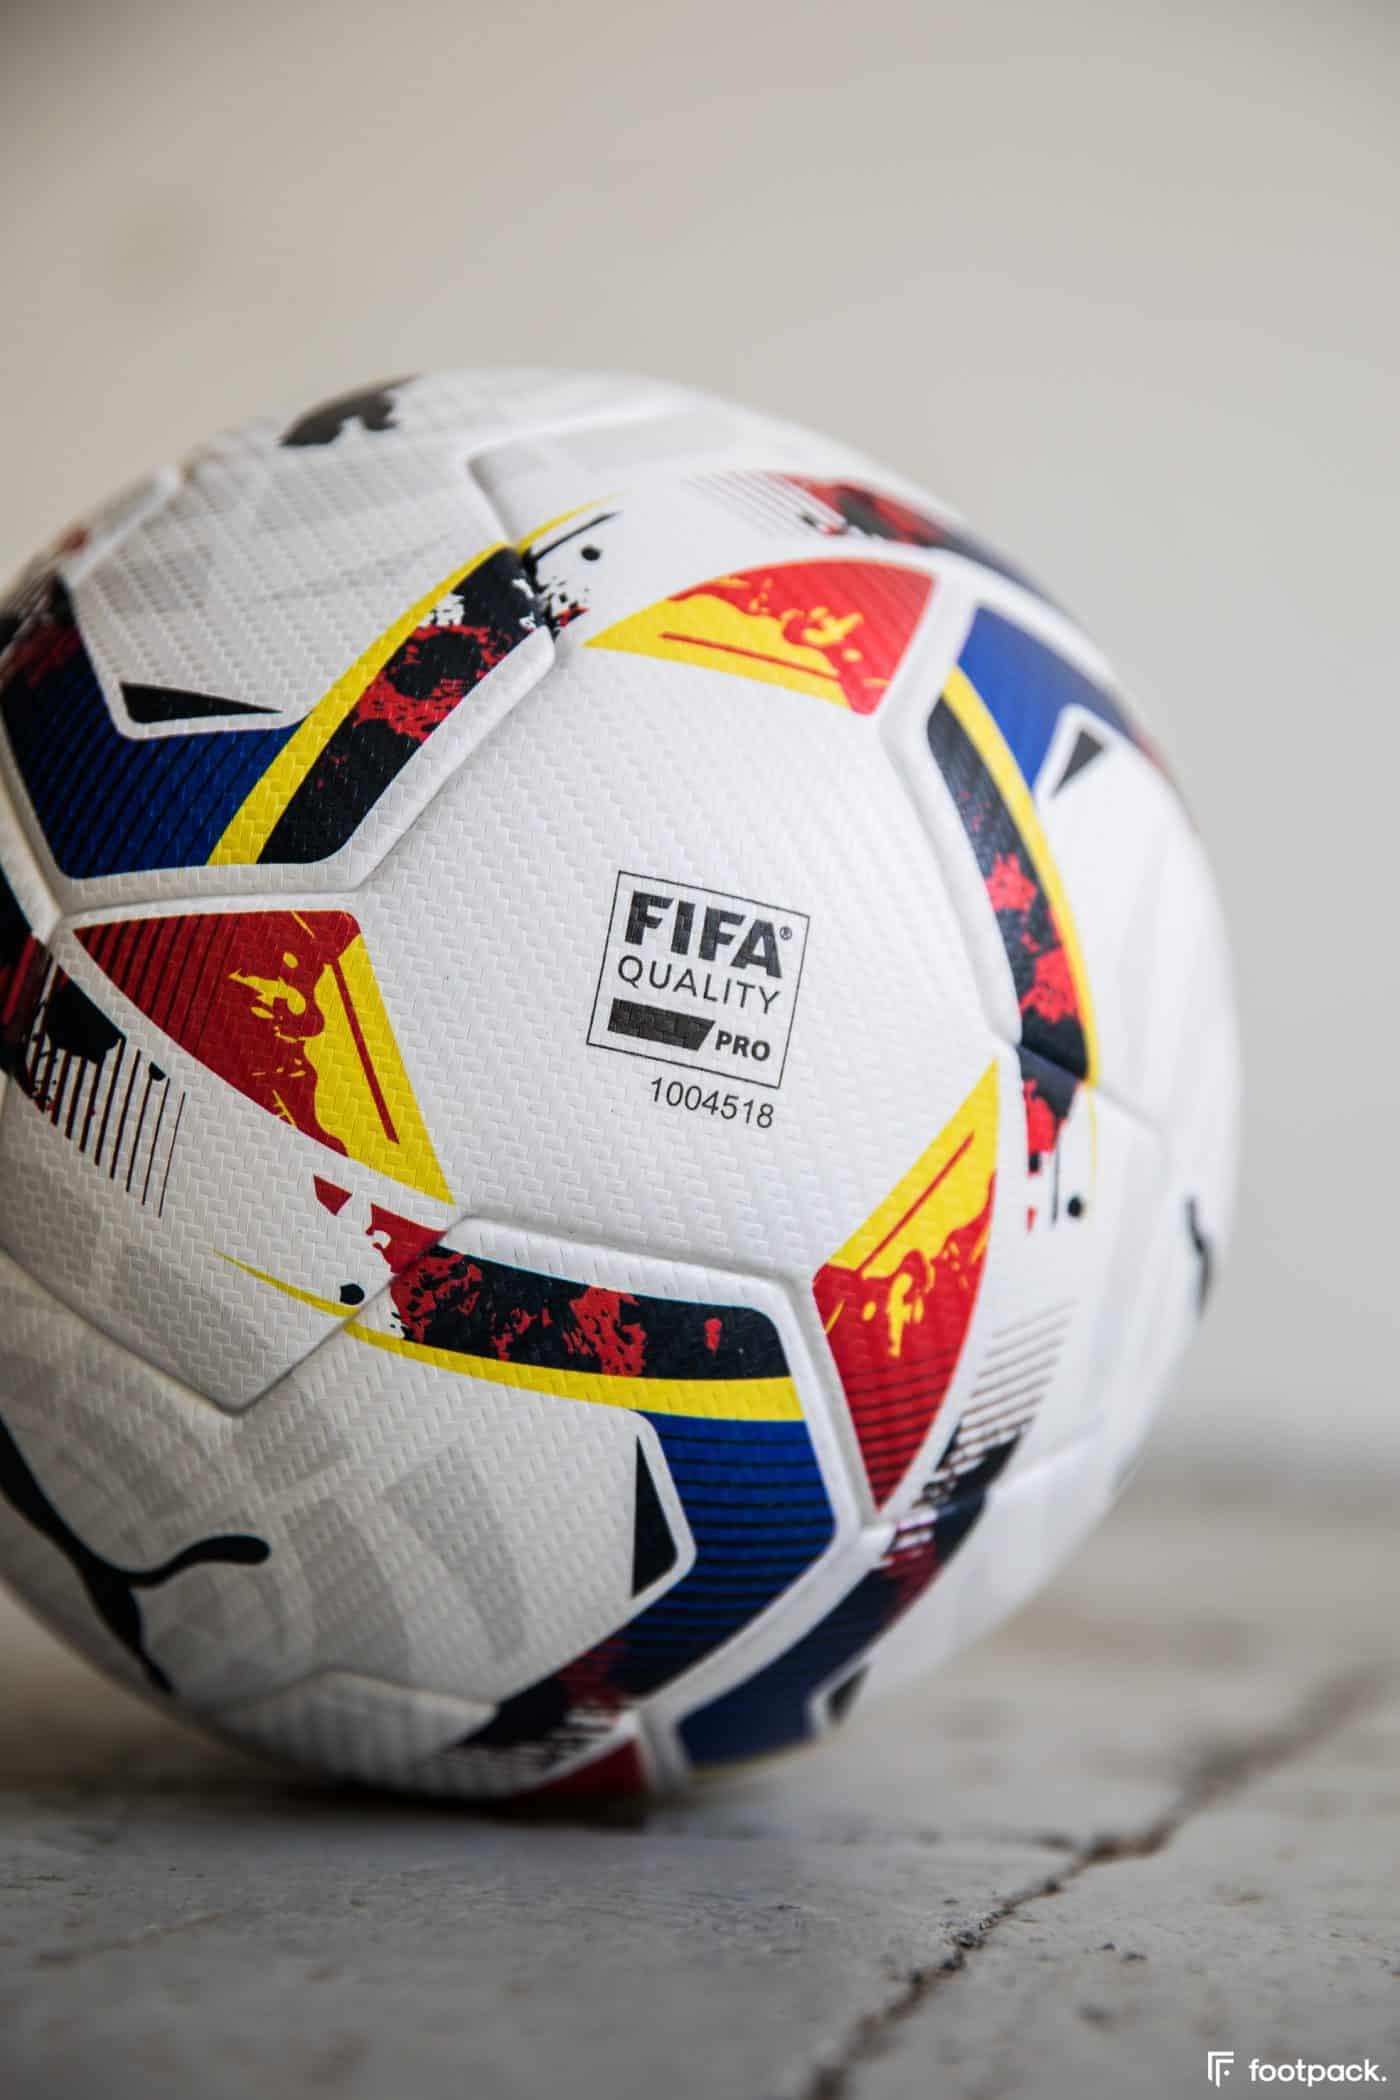 ballon-championnat-espagne-la-liga-2020-2021-puma-footpack-11